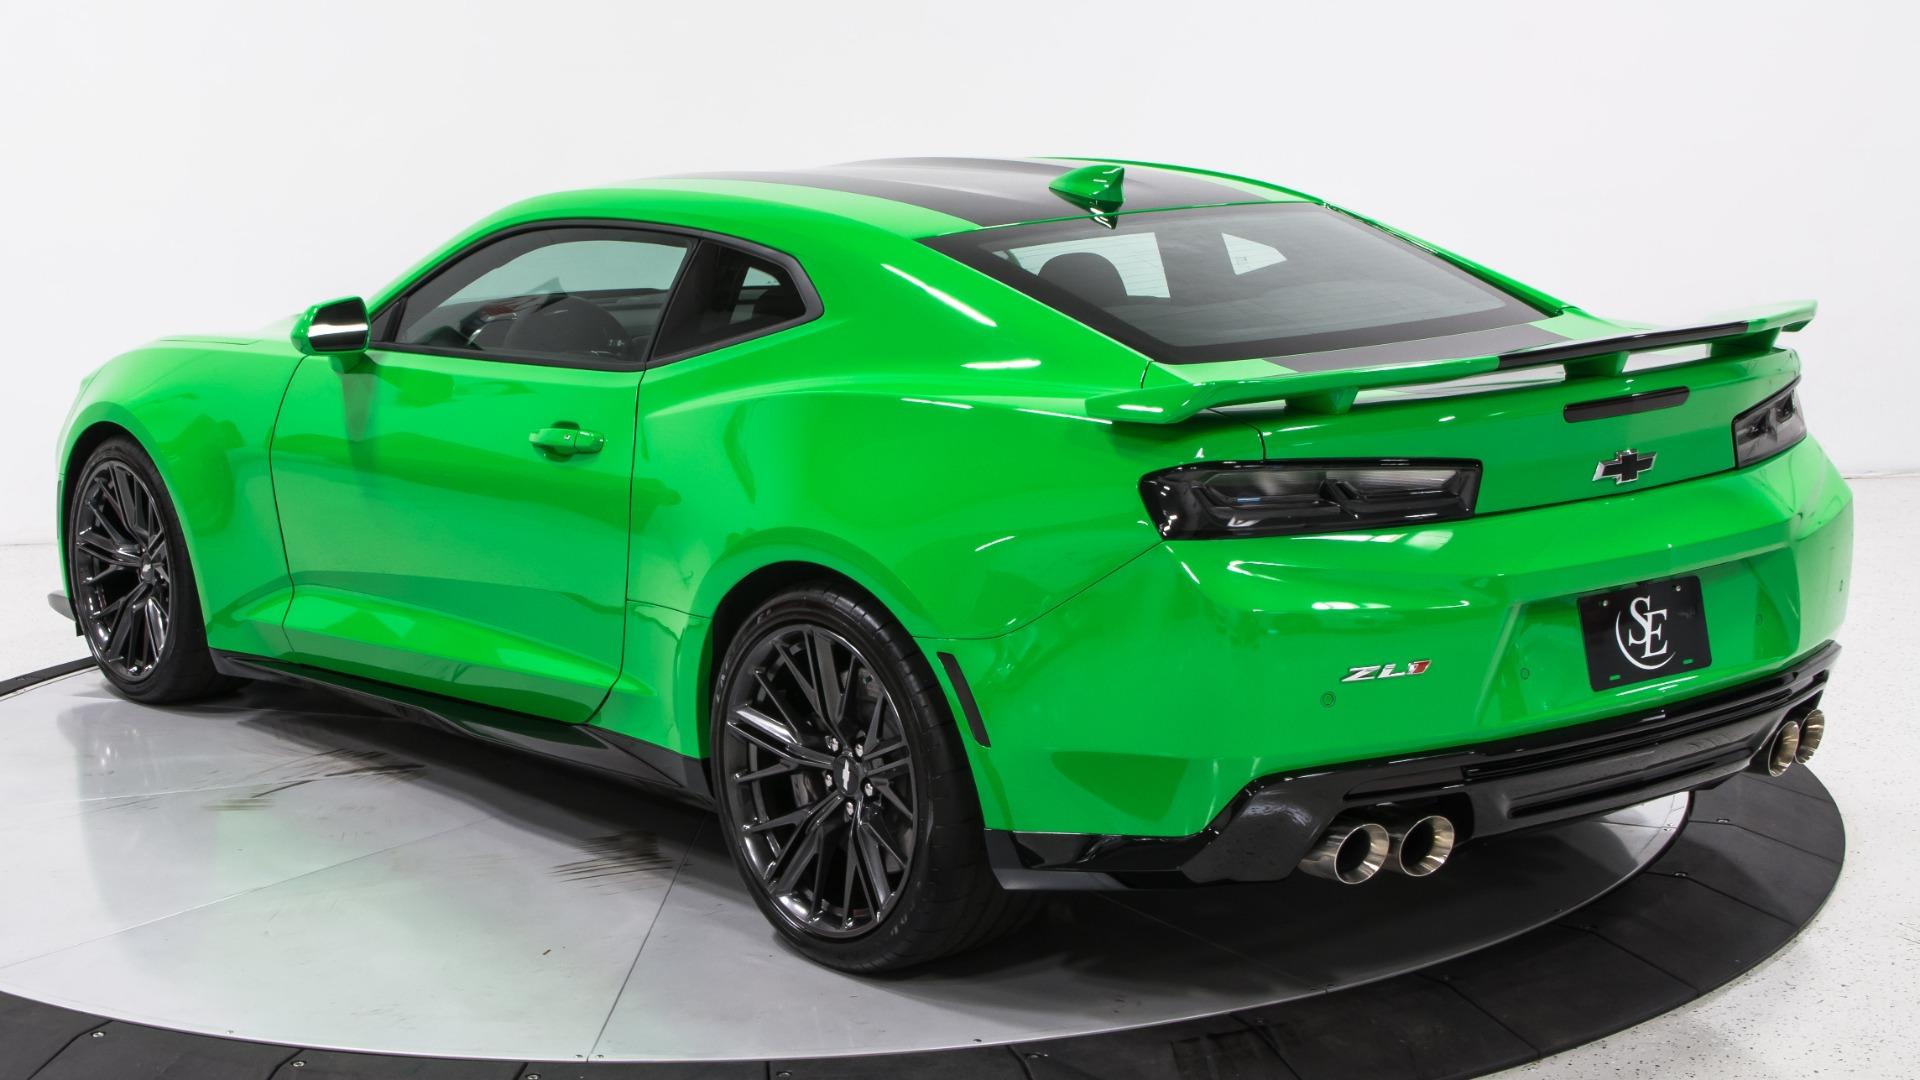 2017 Chevrolet Camaro Zl1 Krypton Green Stock 22644 For